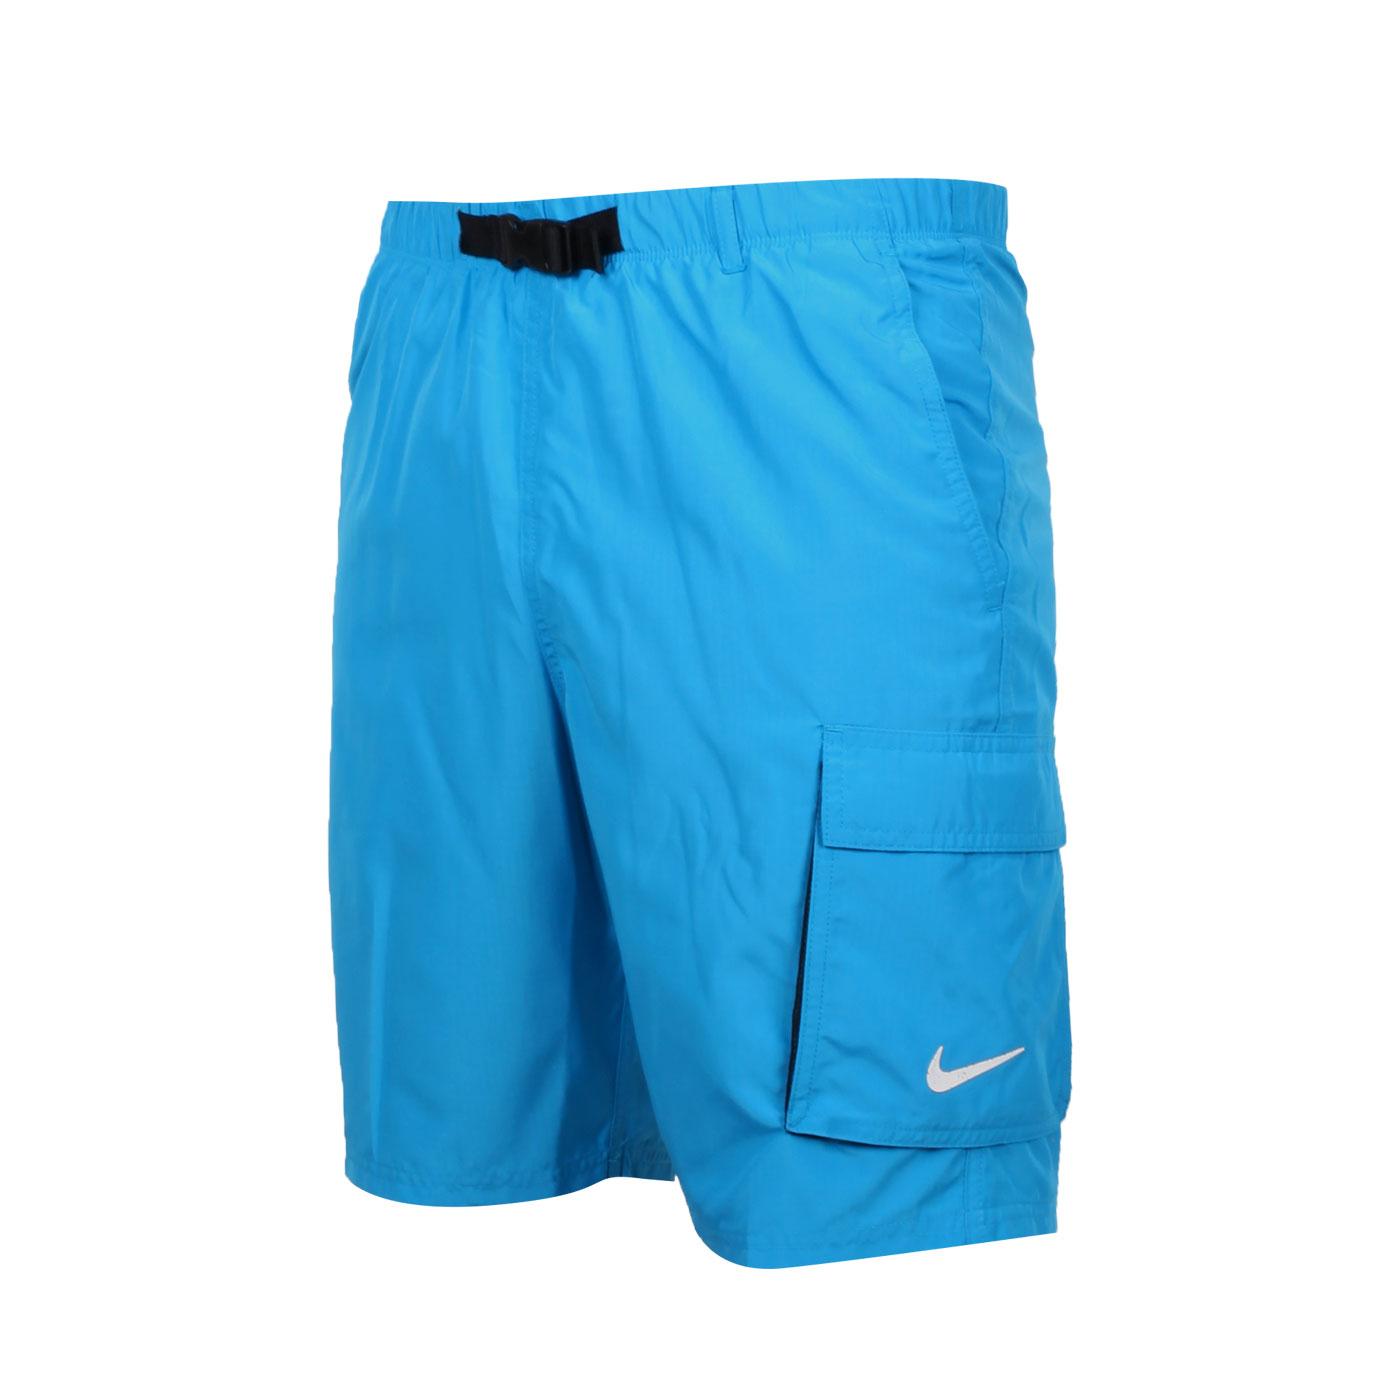 NIKE 男款成人九吋海灘褲 NESSB521-406 - 寶藍白